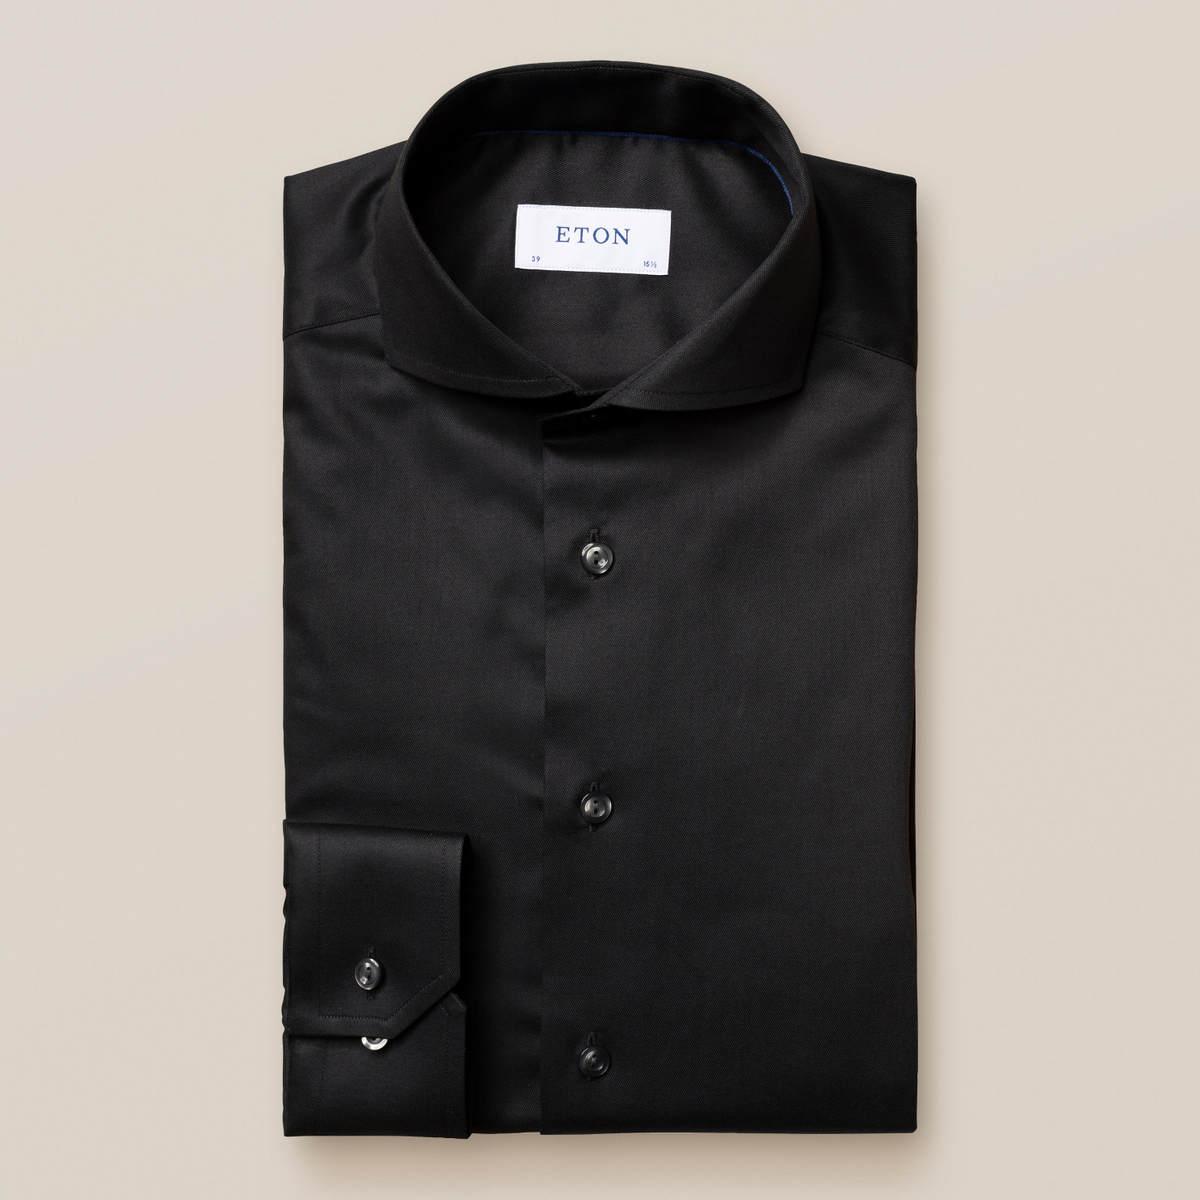 Svart skjorta i twill med stretch och extreme cut away-krage